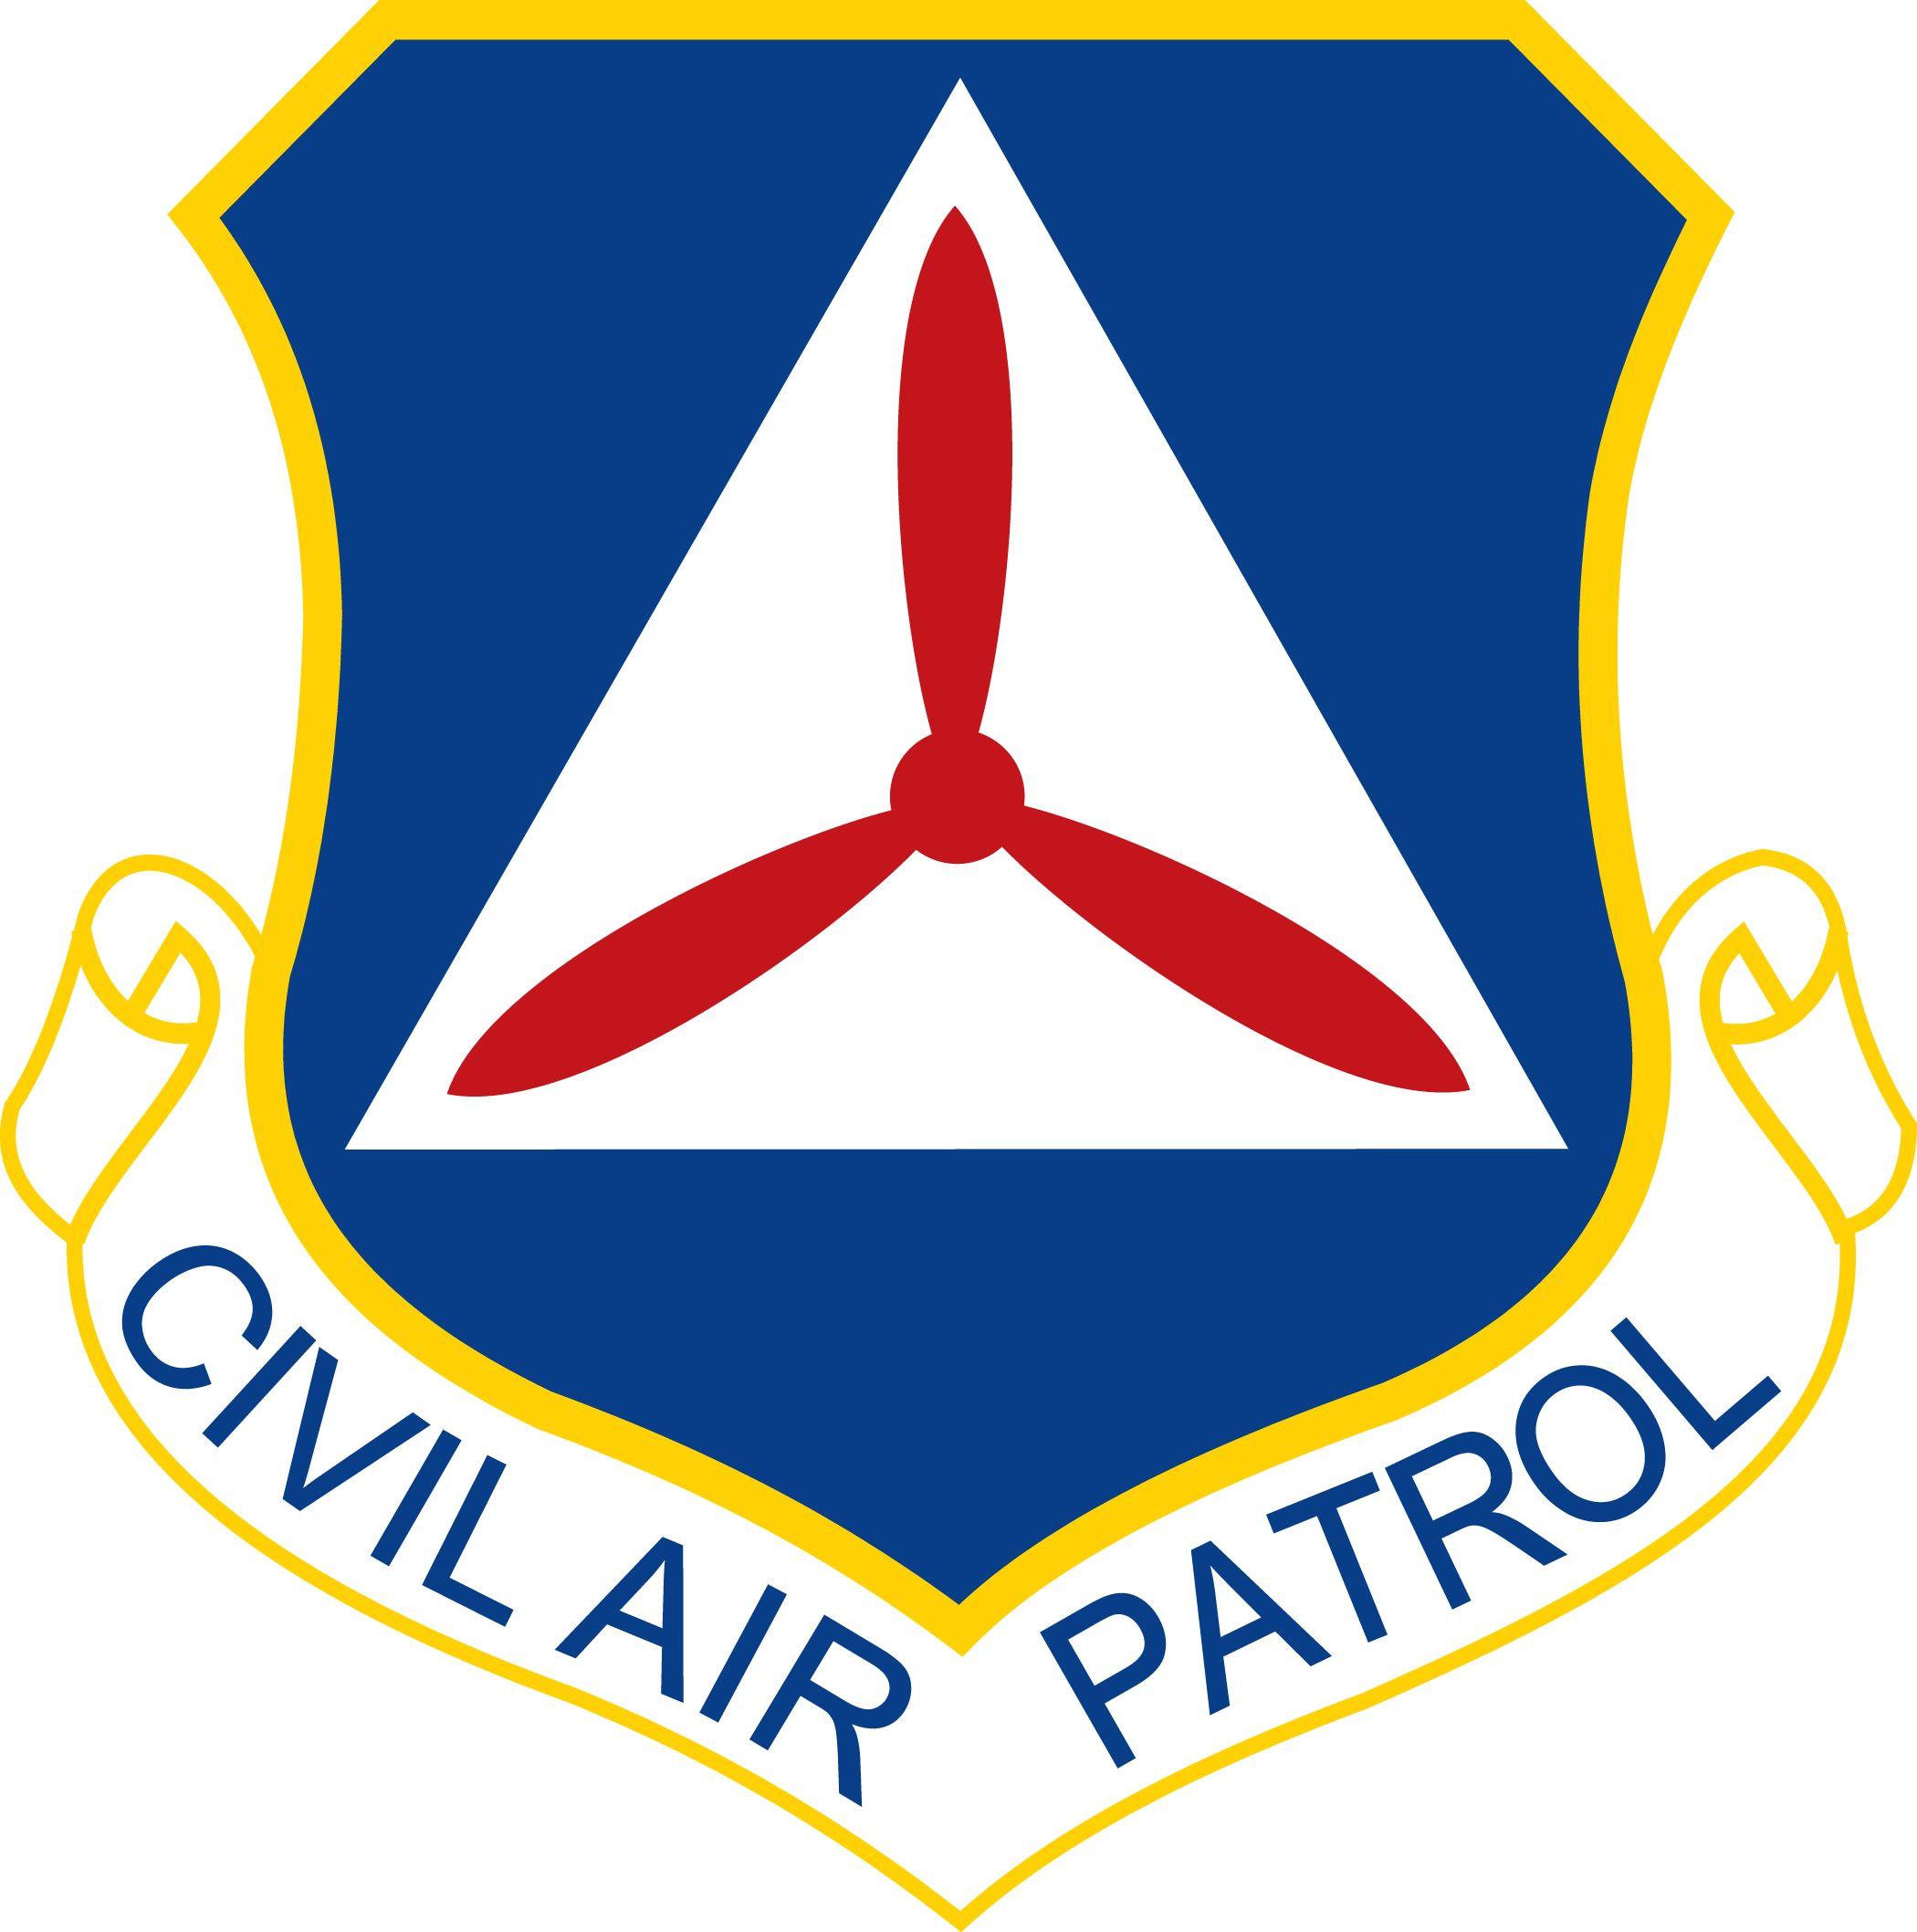 CAP logo Civil air patrol, United states air force